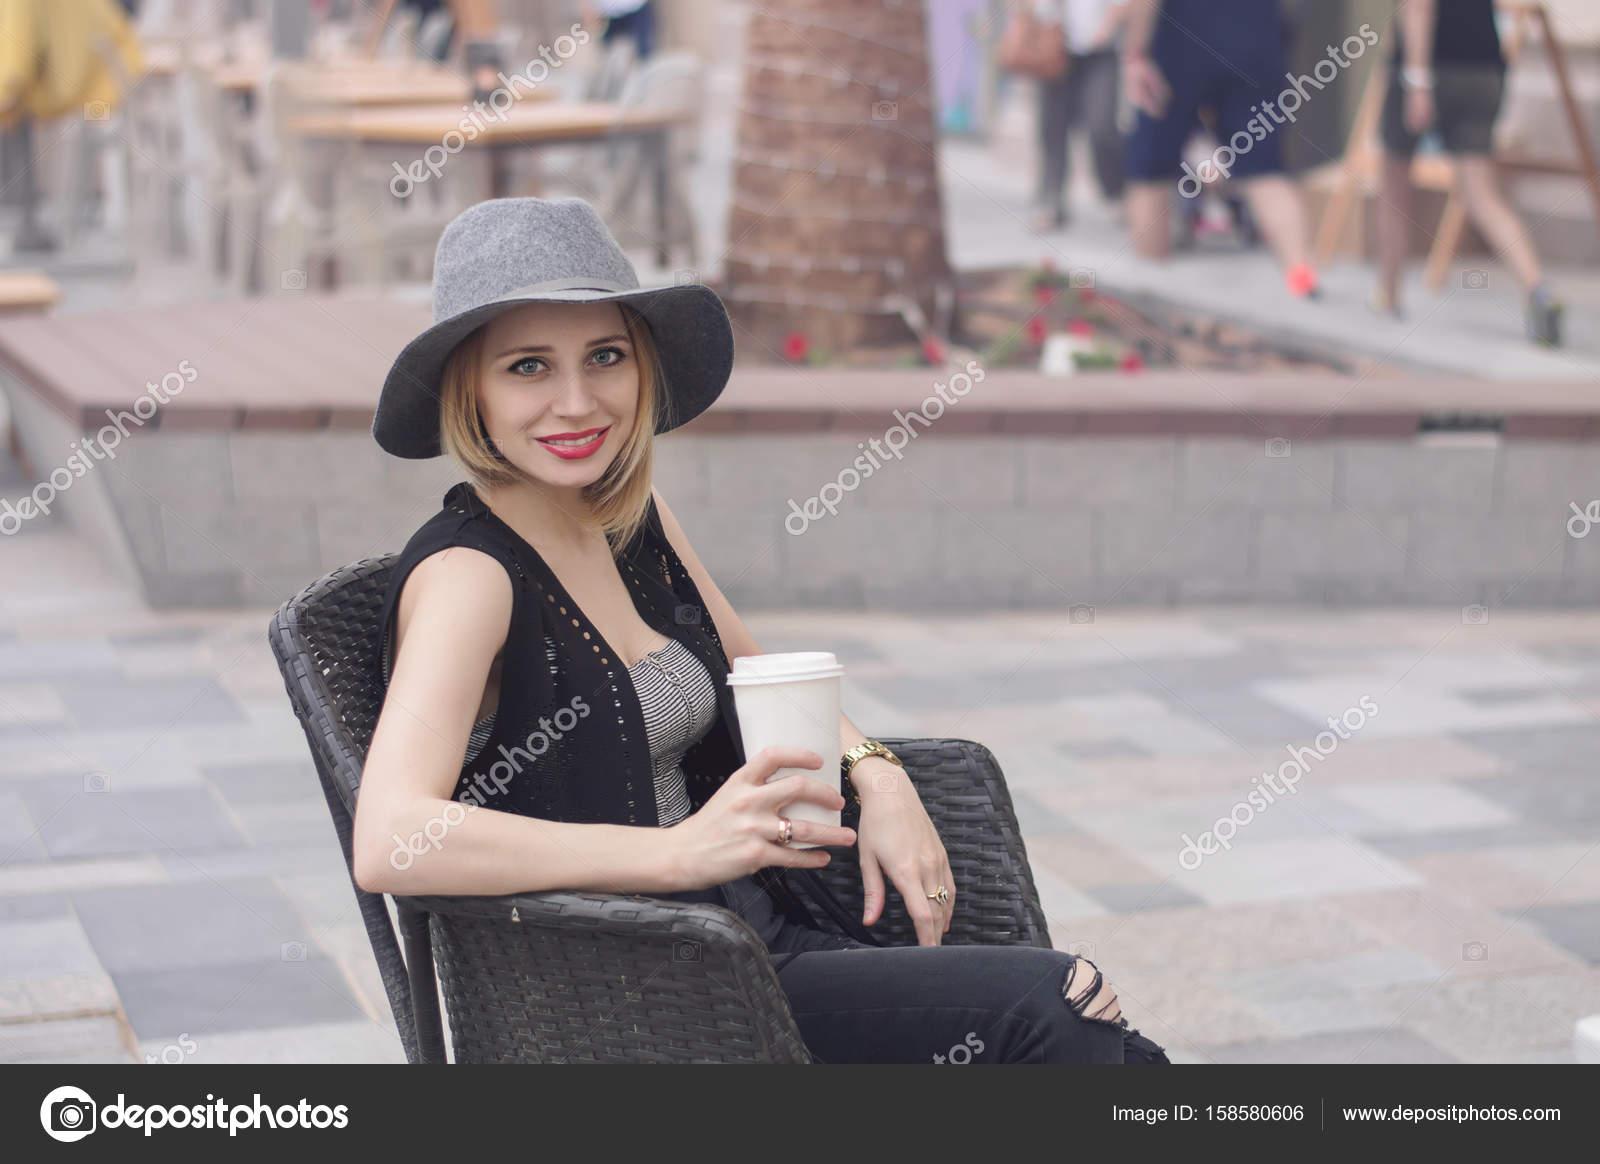 4a3b196b129be Retrato de mujer rubia joven con bob corte peinado